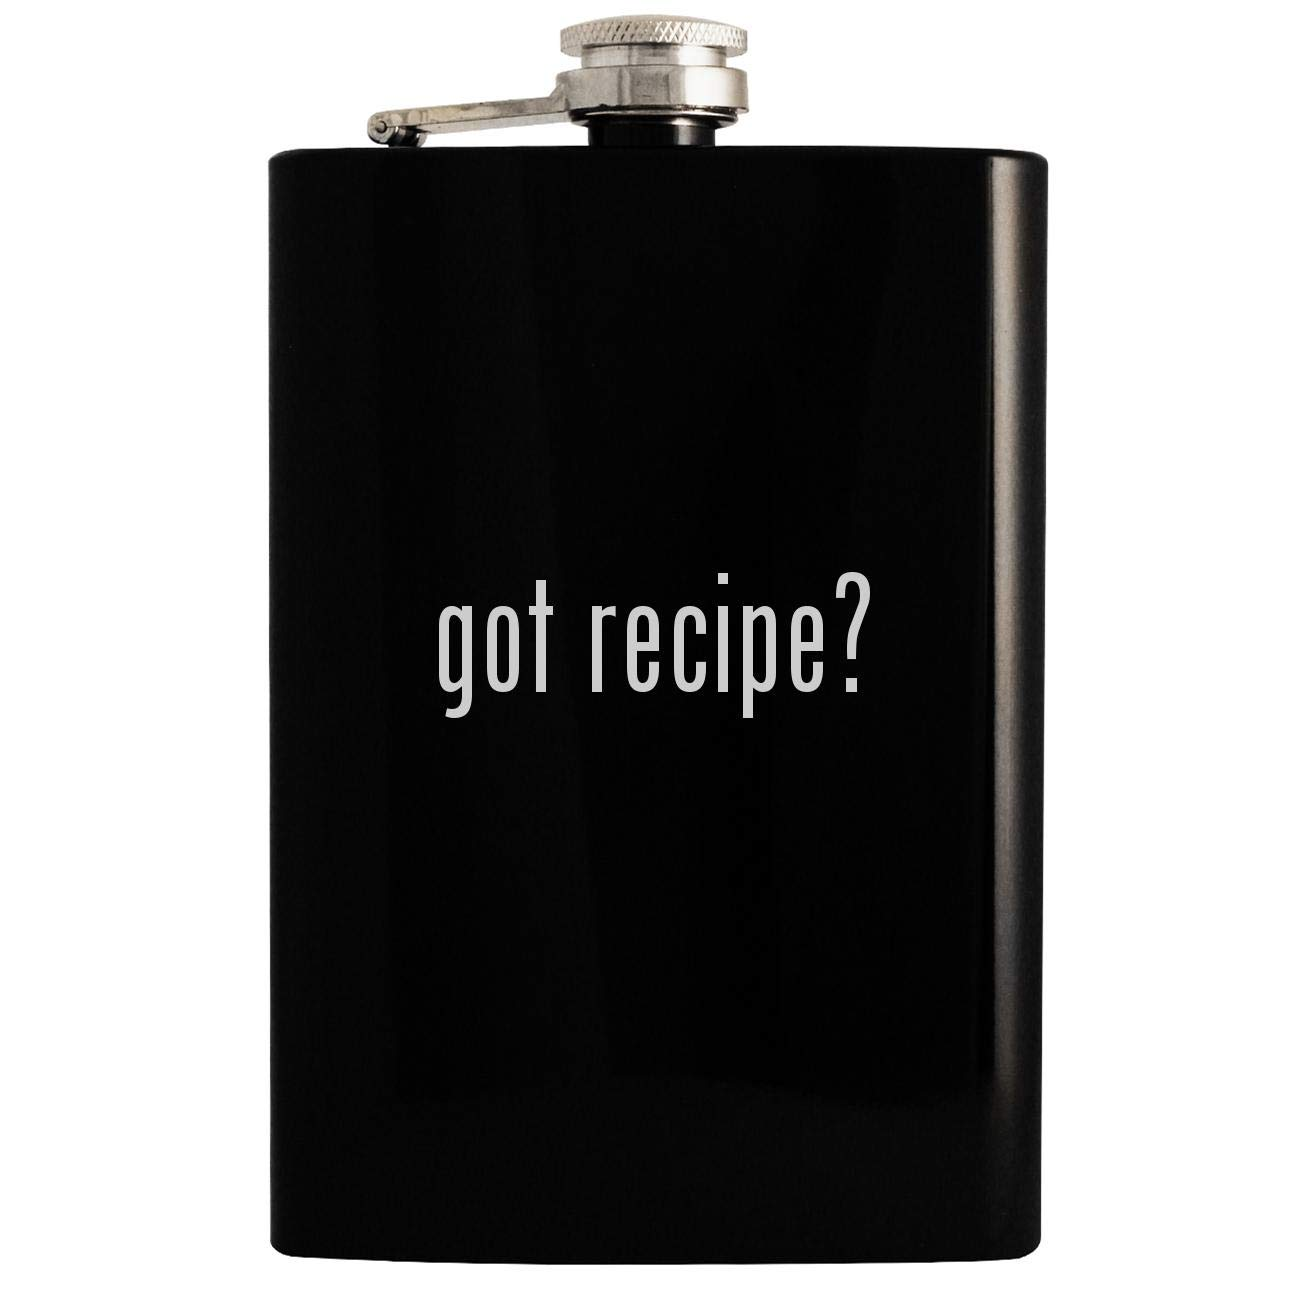 got recipe? - 8oz Hip Drinking Alcohol Flask, Black